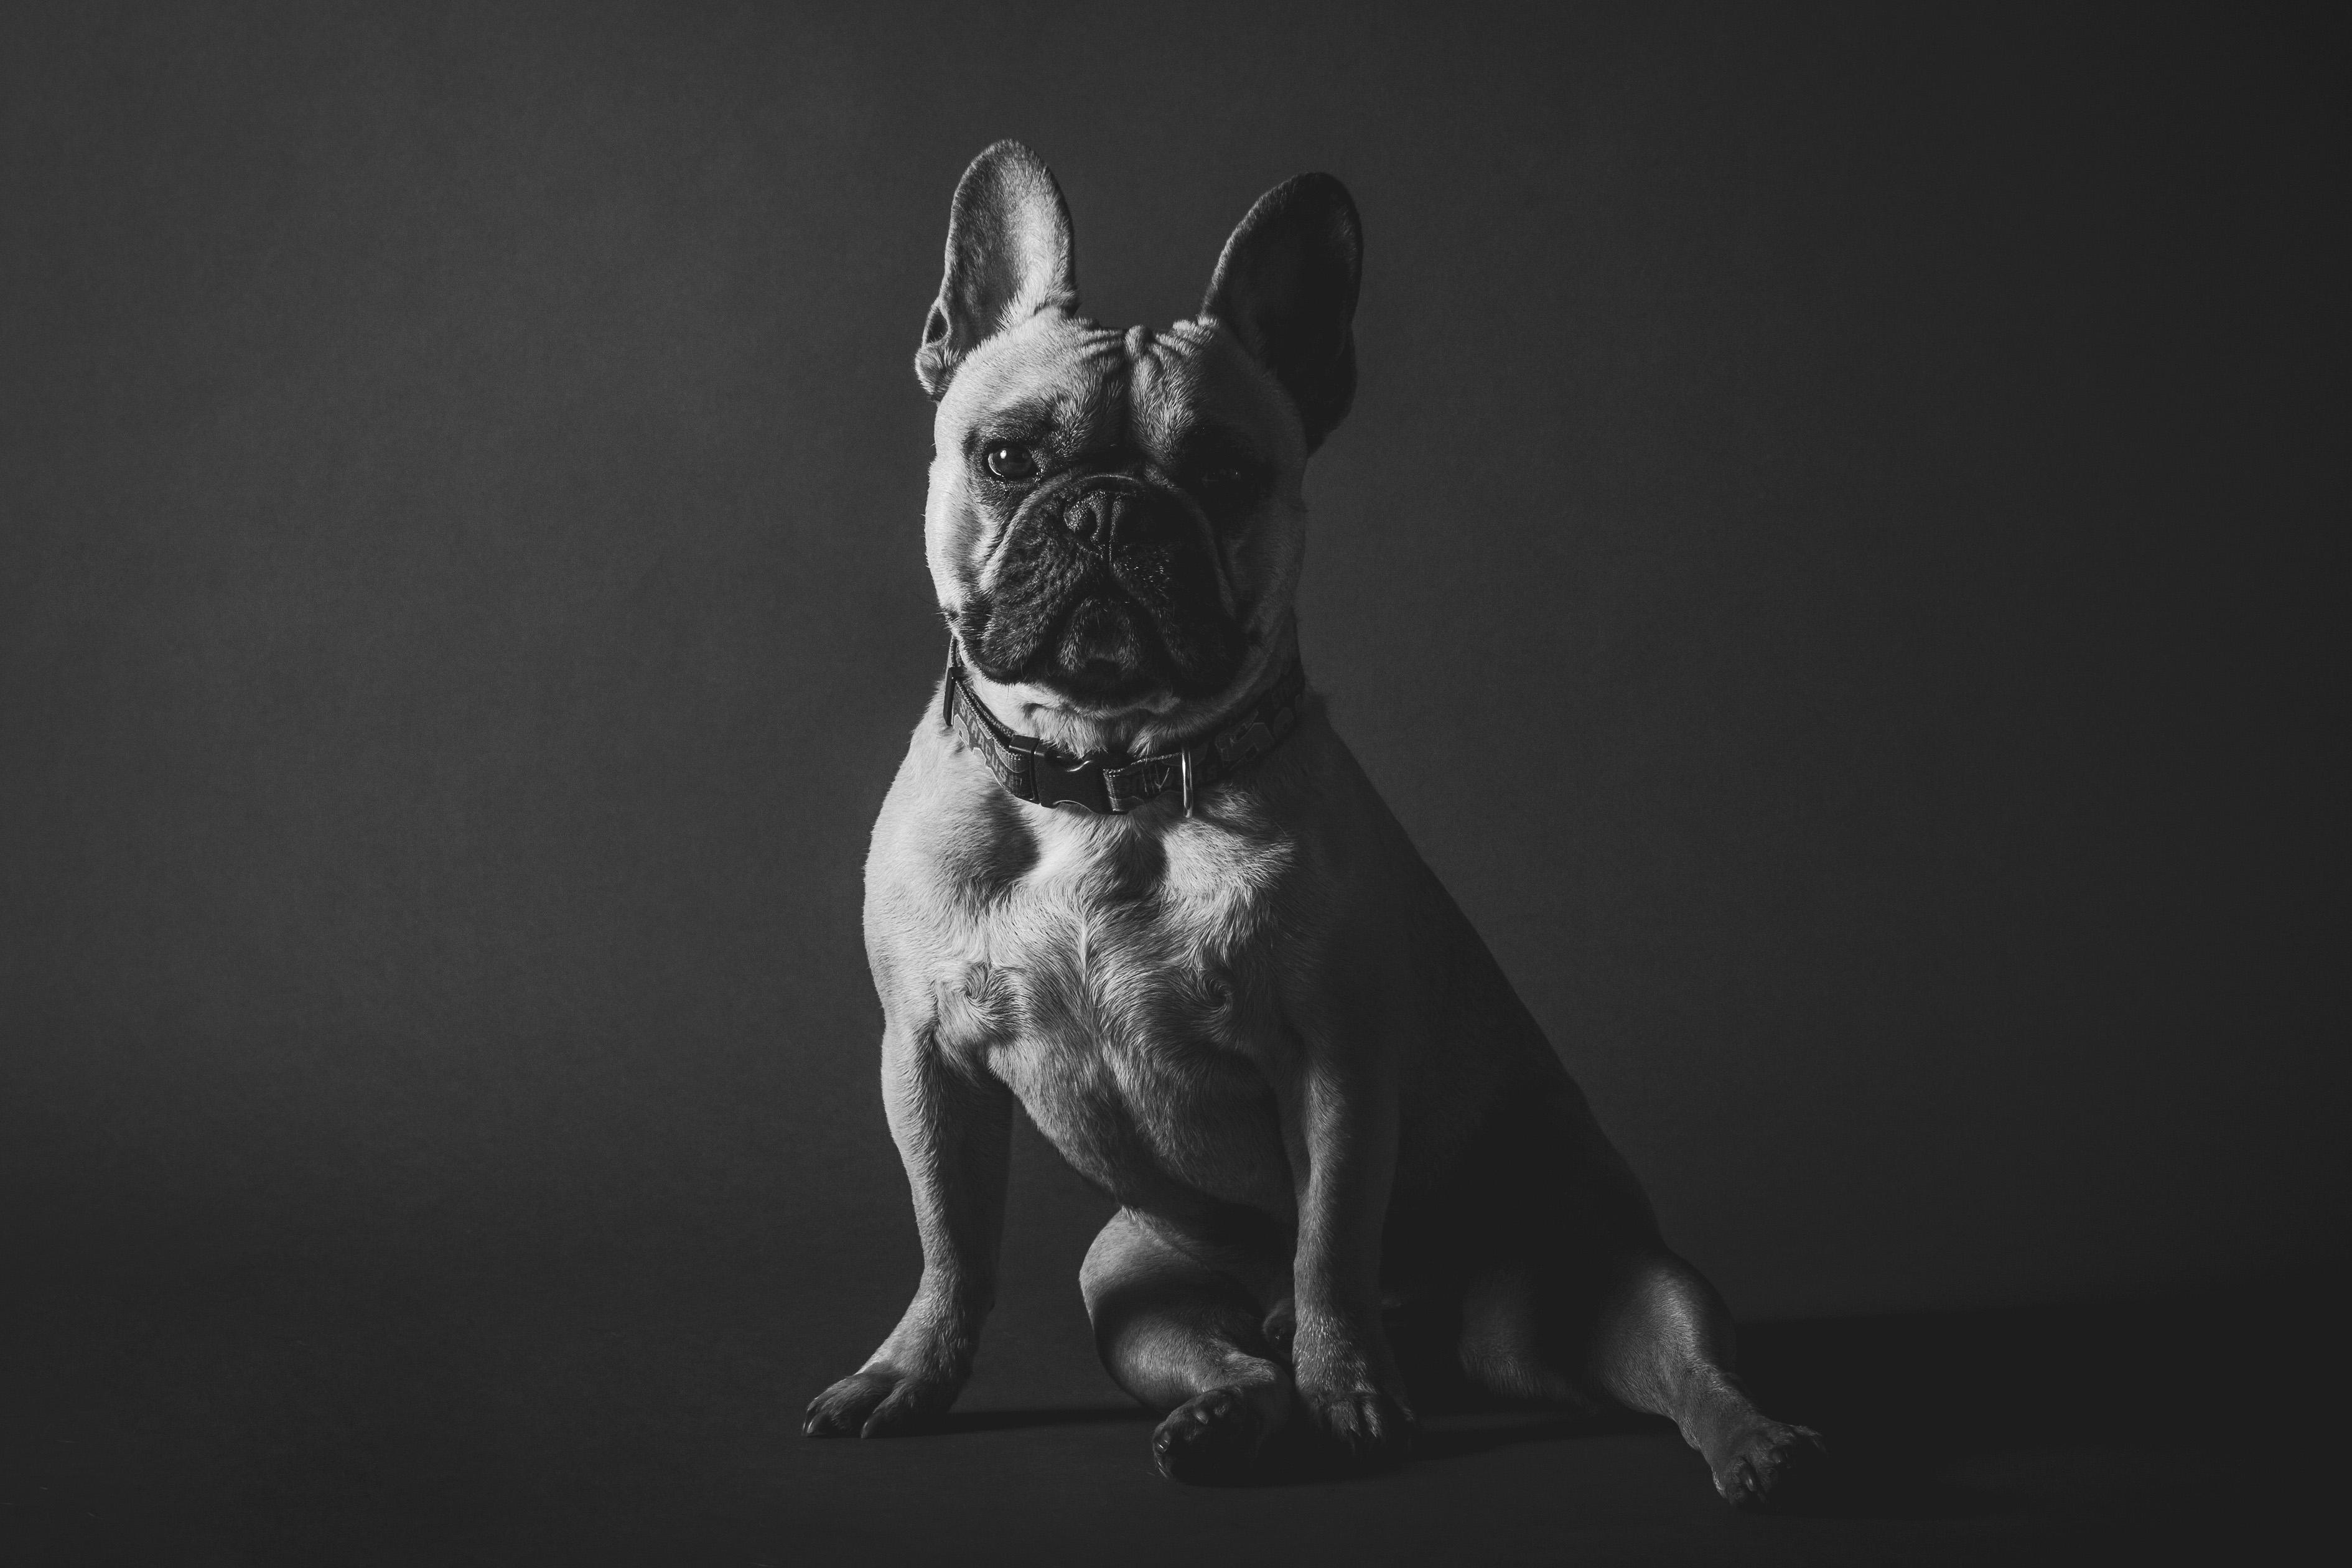 Dog Portrait Free Photo - ISO Republic